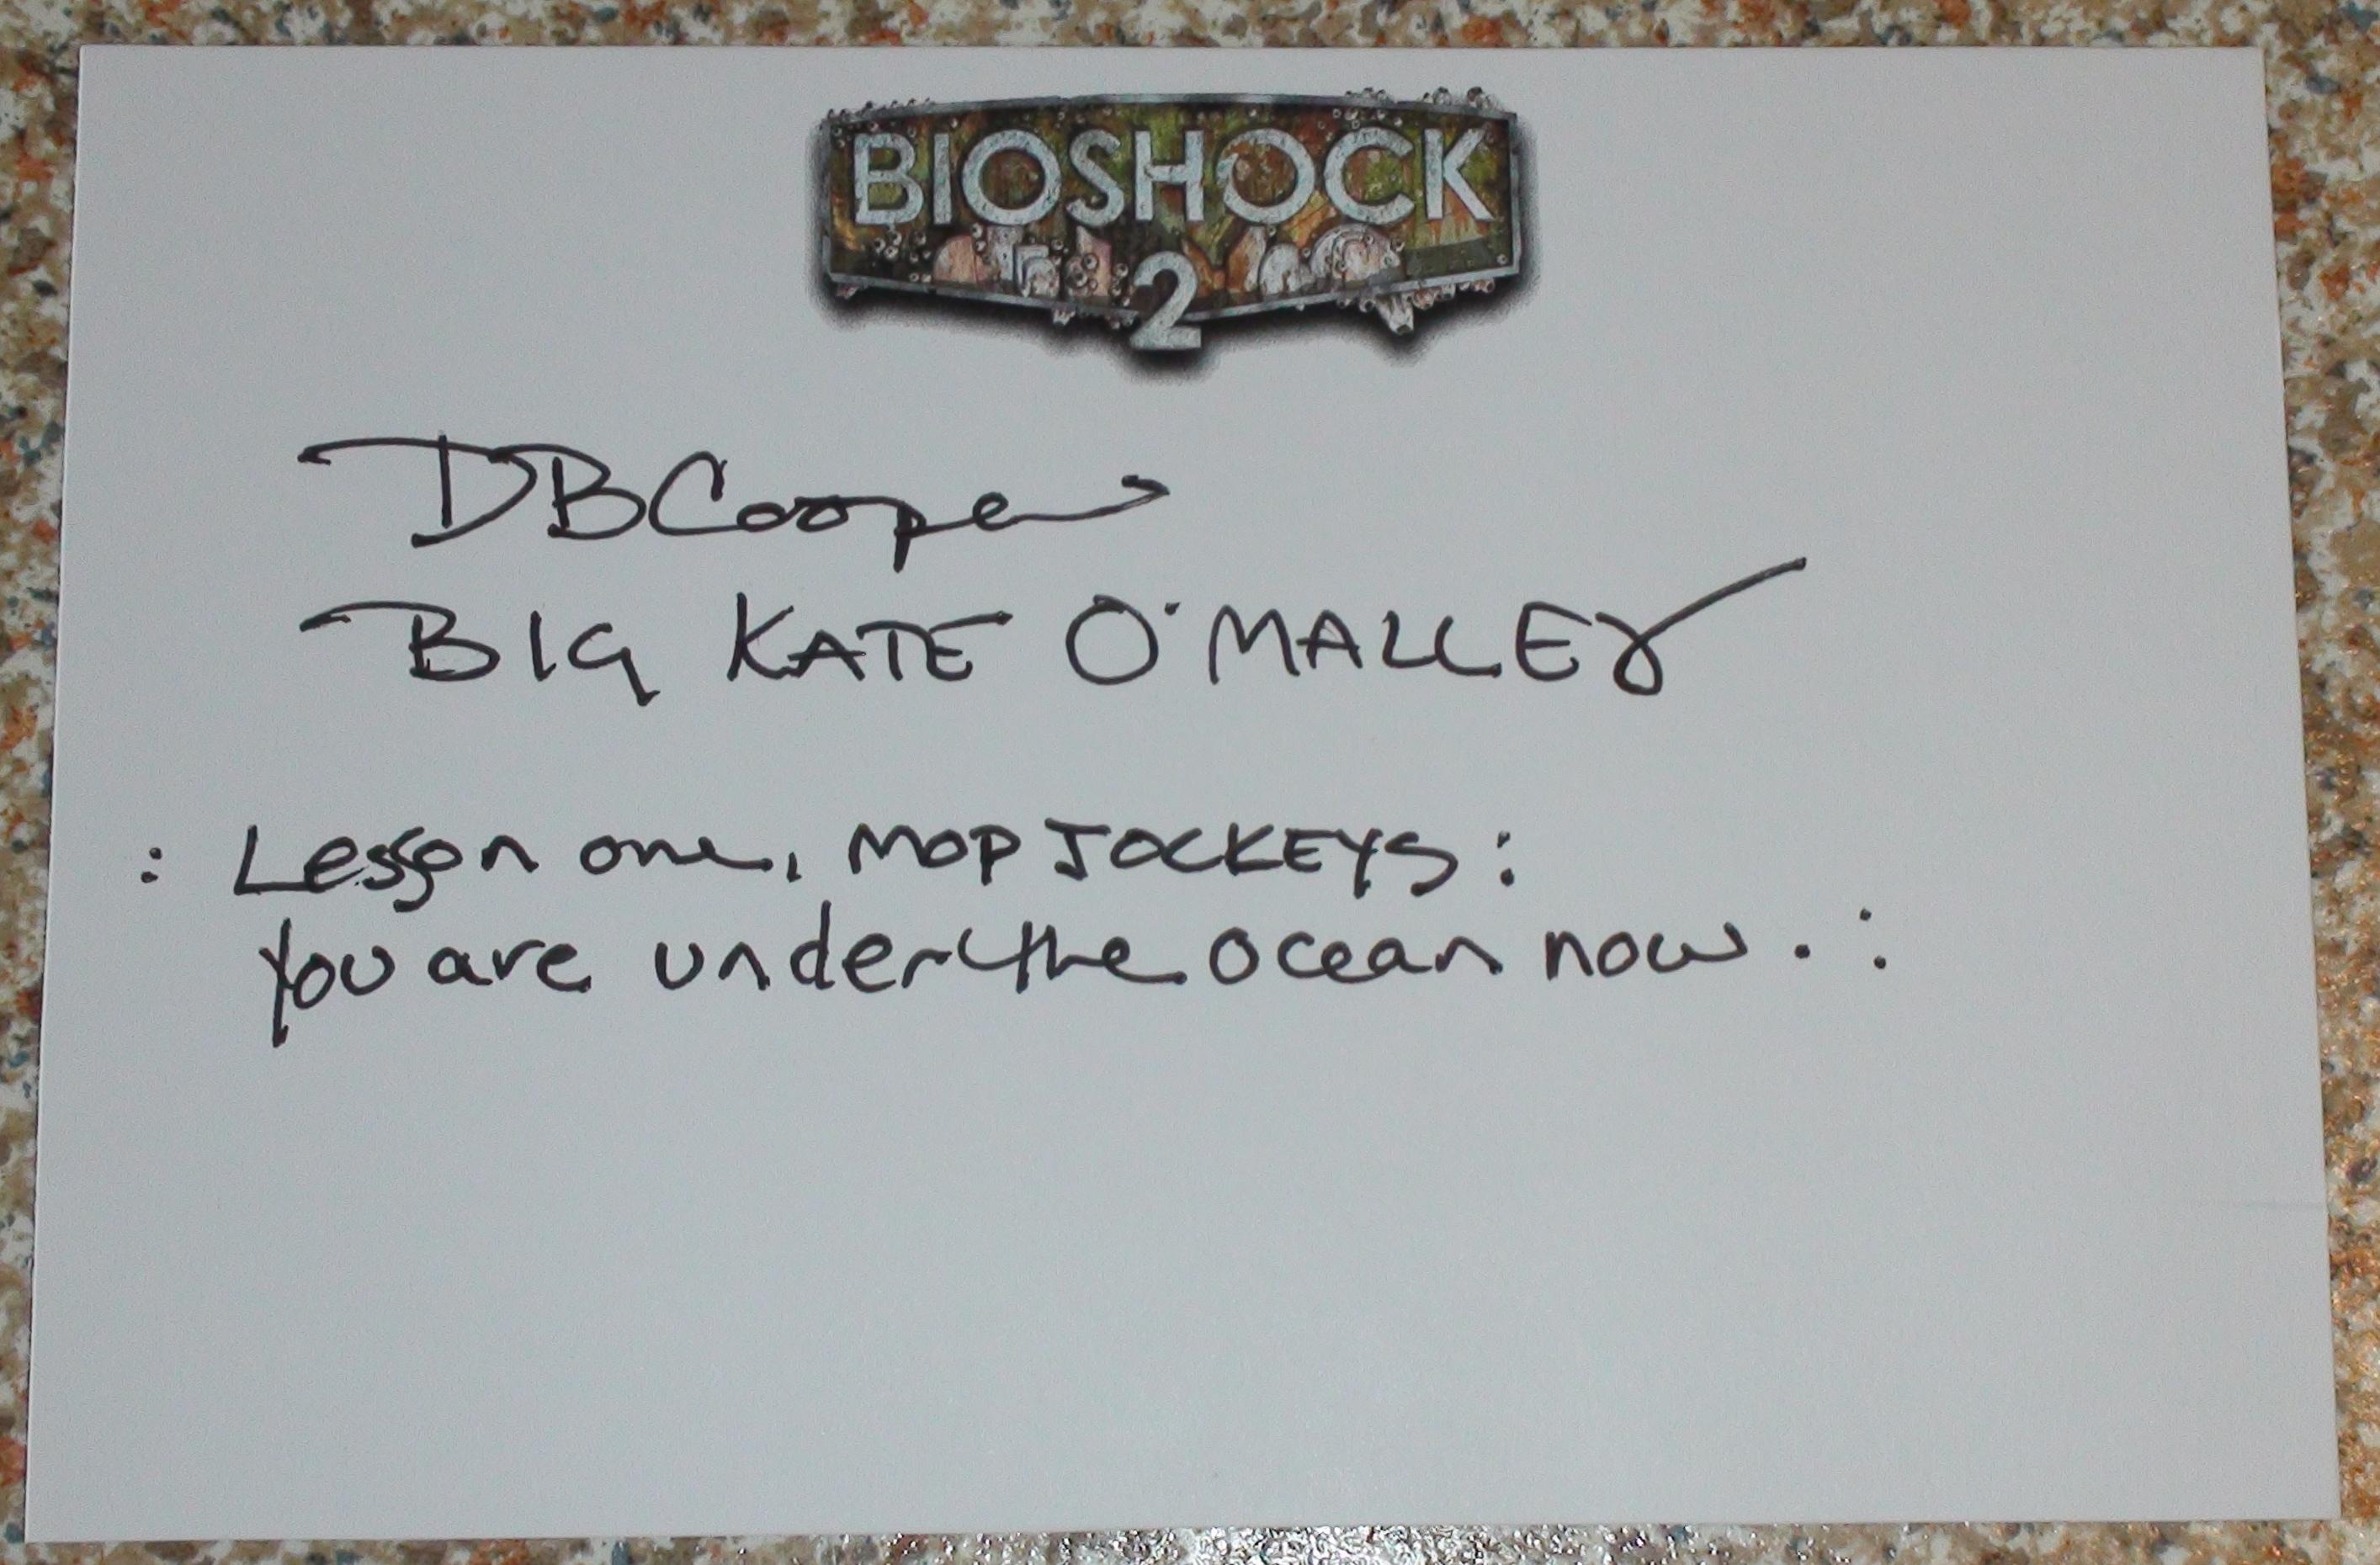 Bioshock 2 - DB Cooper